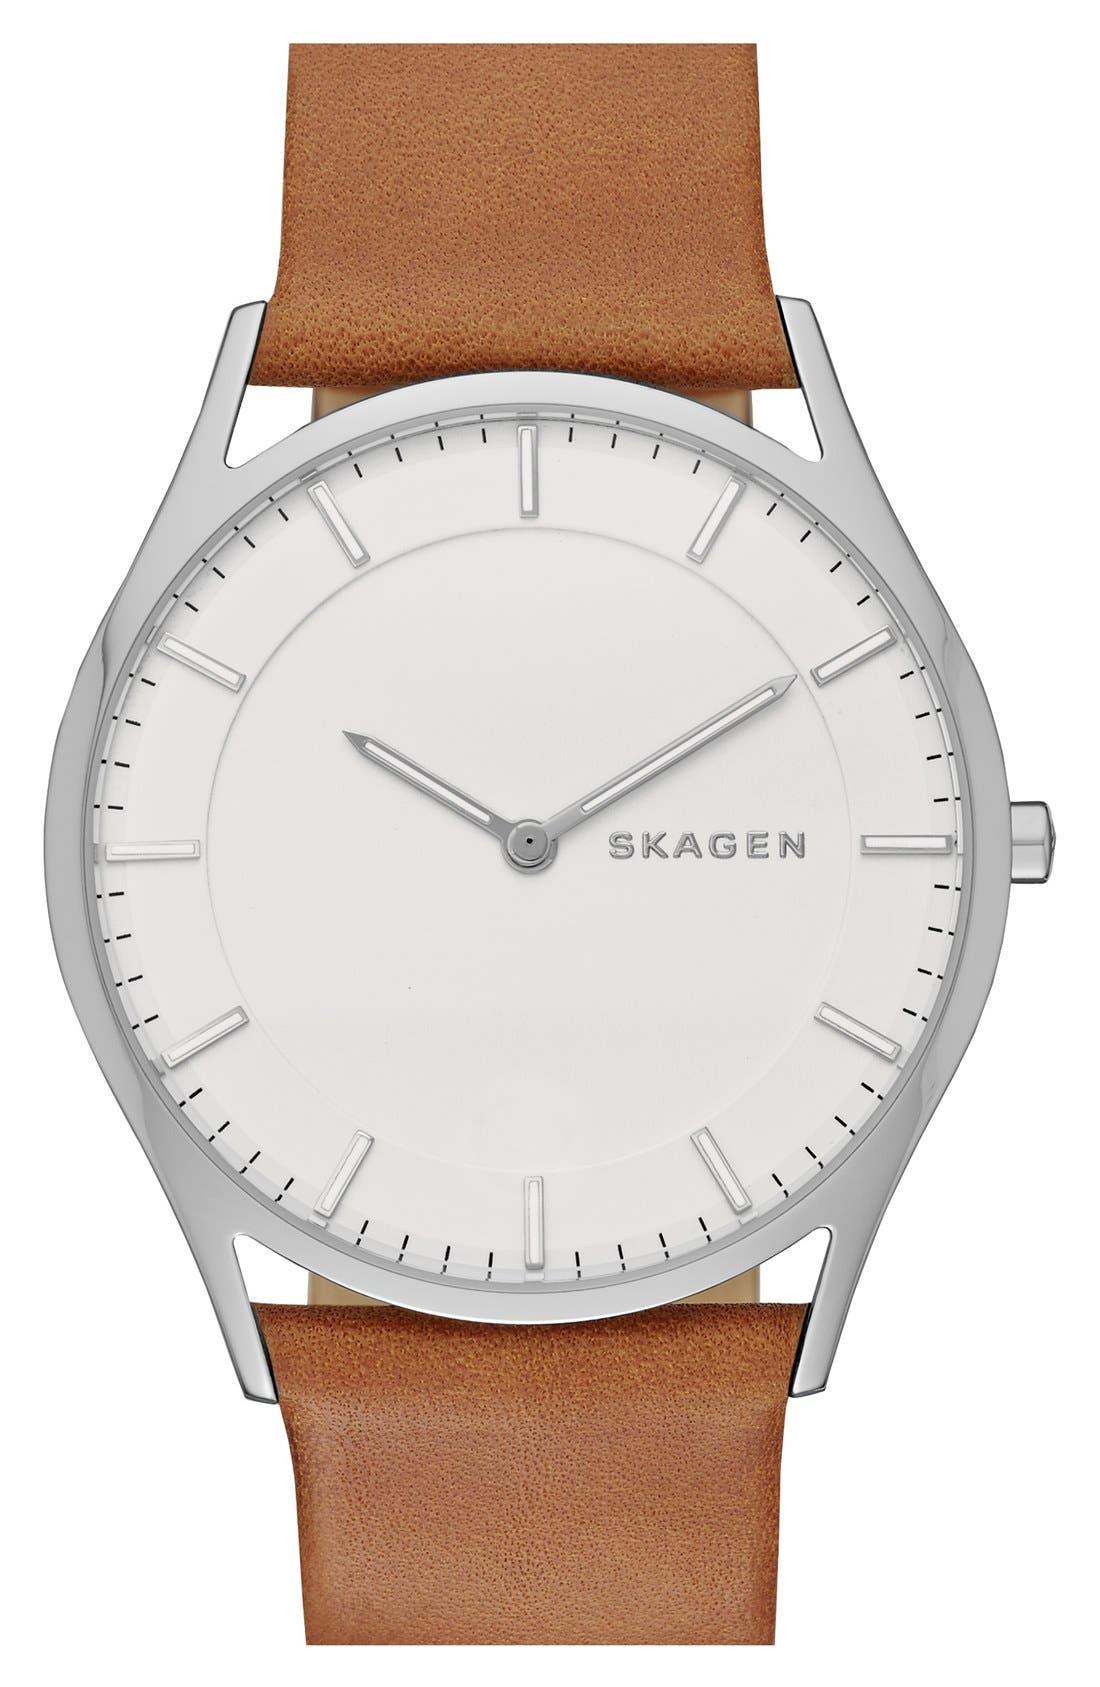 Alternate Image 1 Selected - Skagen 'Holst' Leather Strap Watch, 40mm